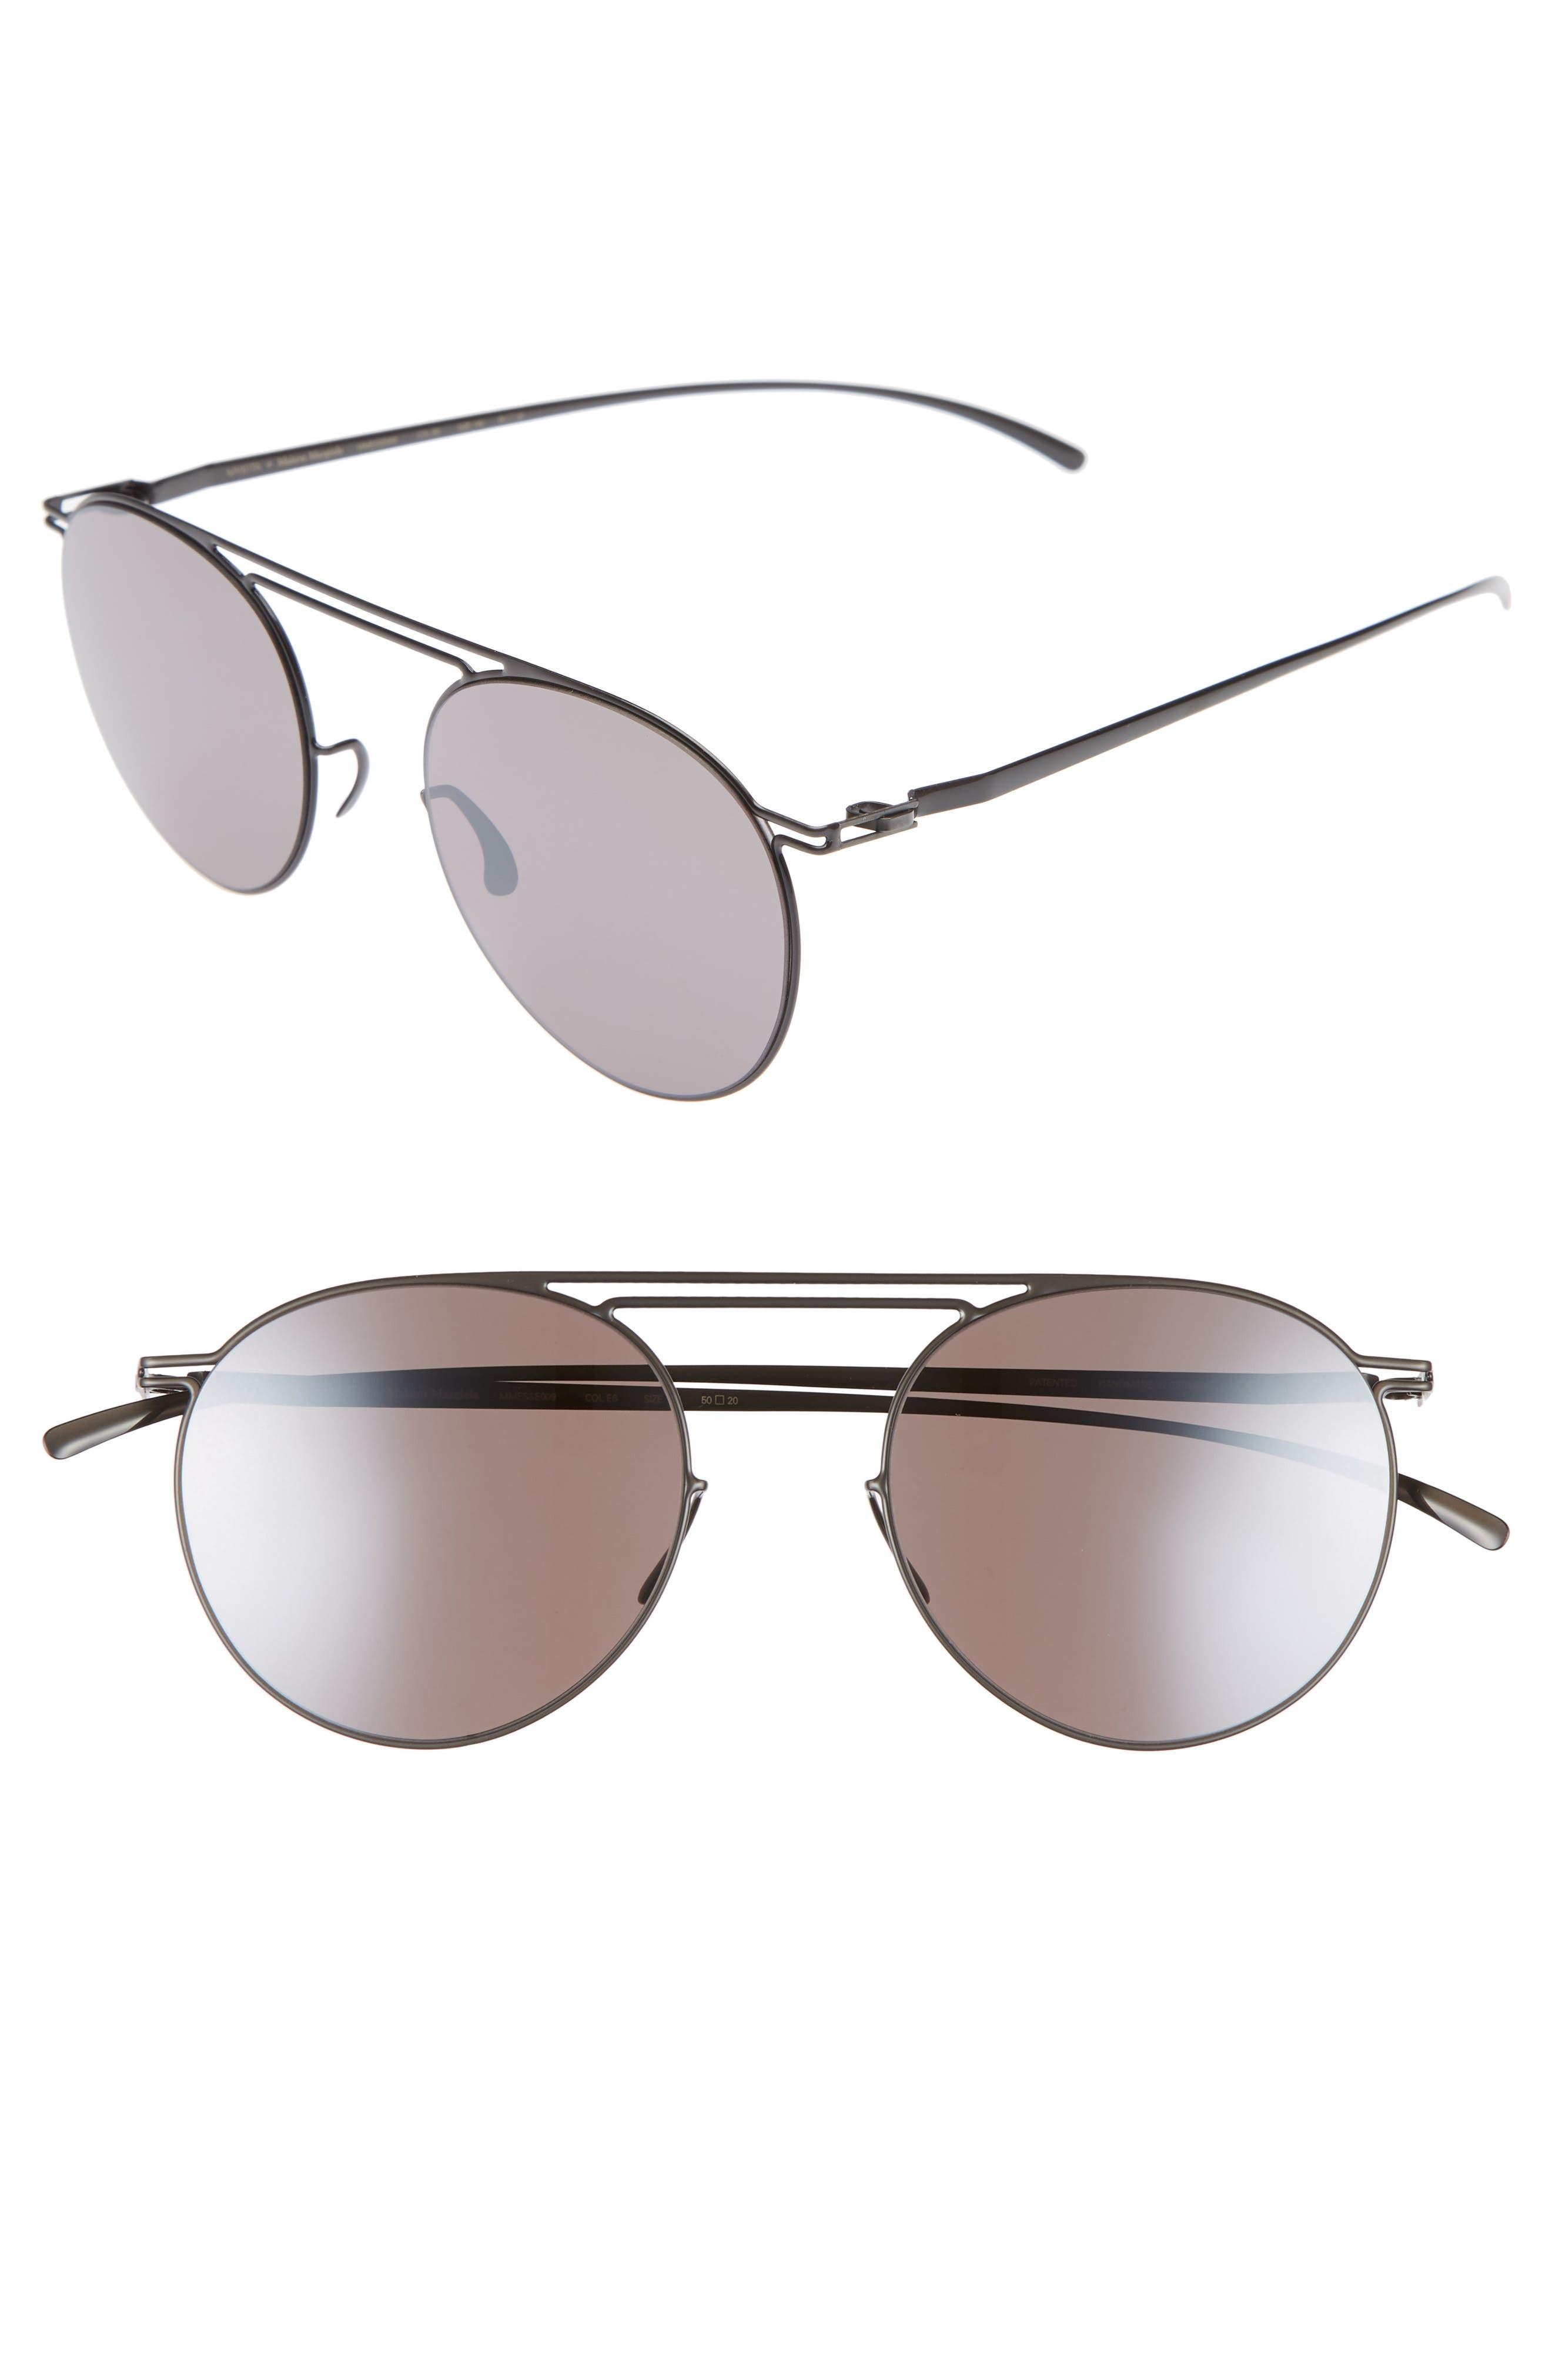 MMESSE009 50mm Sunglasses,                             Main thumbnail 1, color,                             Dark Grey